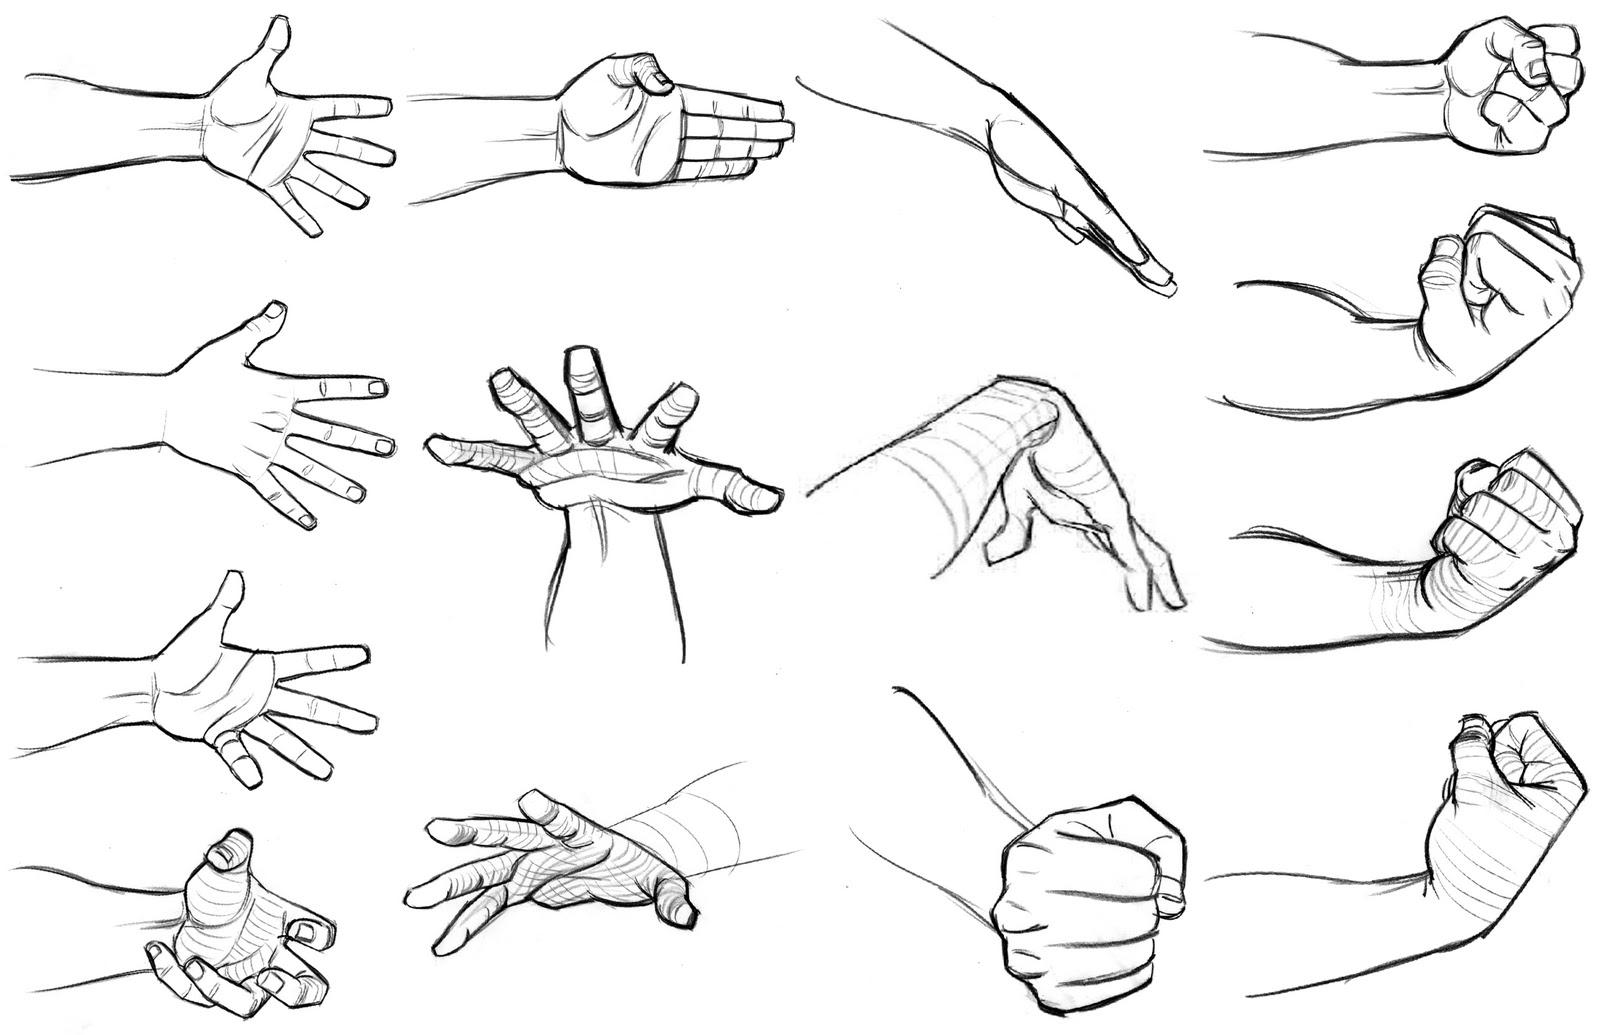 twins tangents class 2 week 9 hand tips